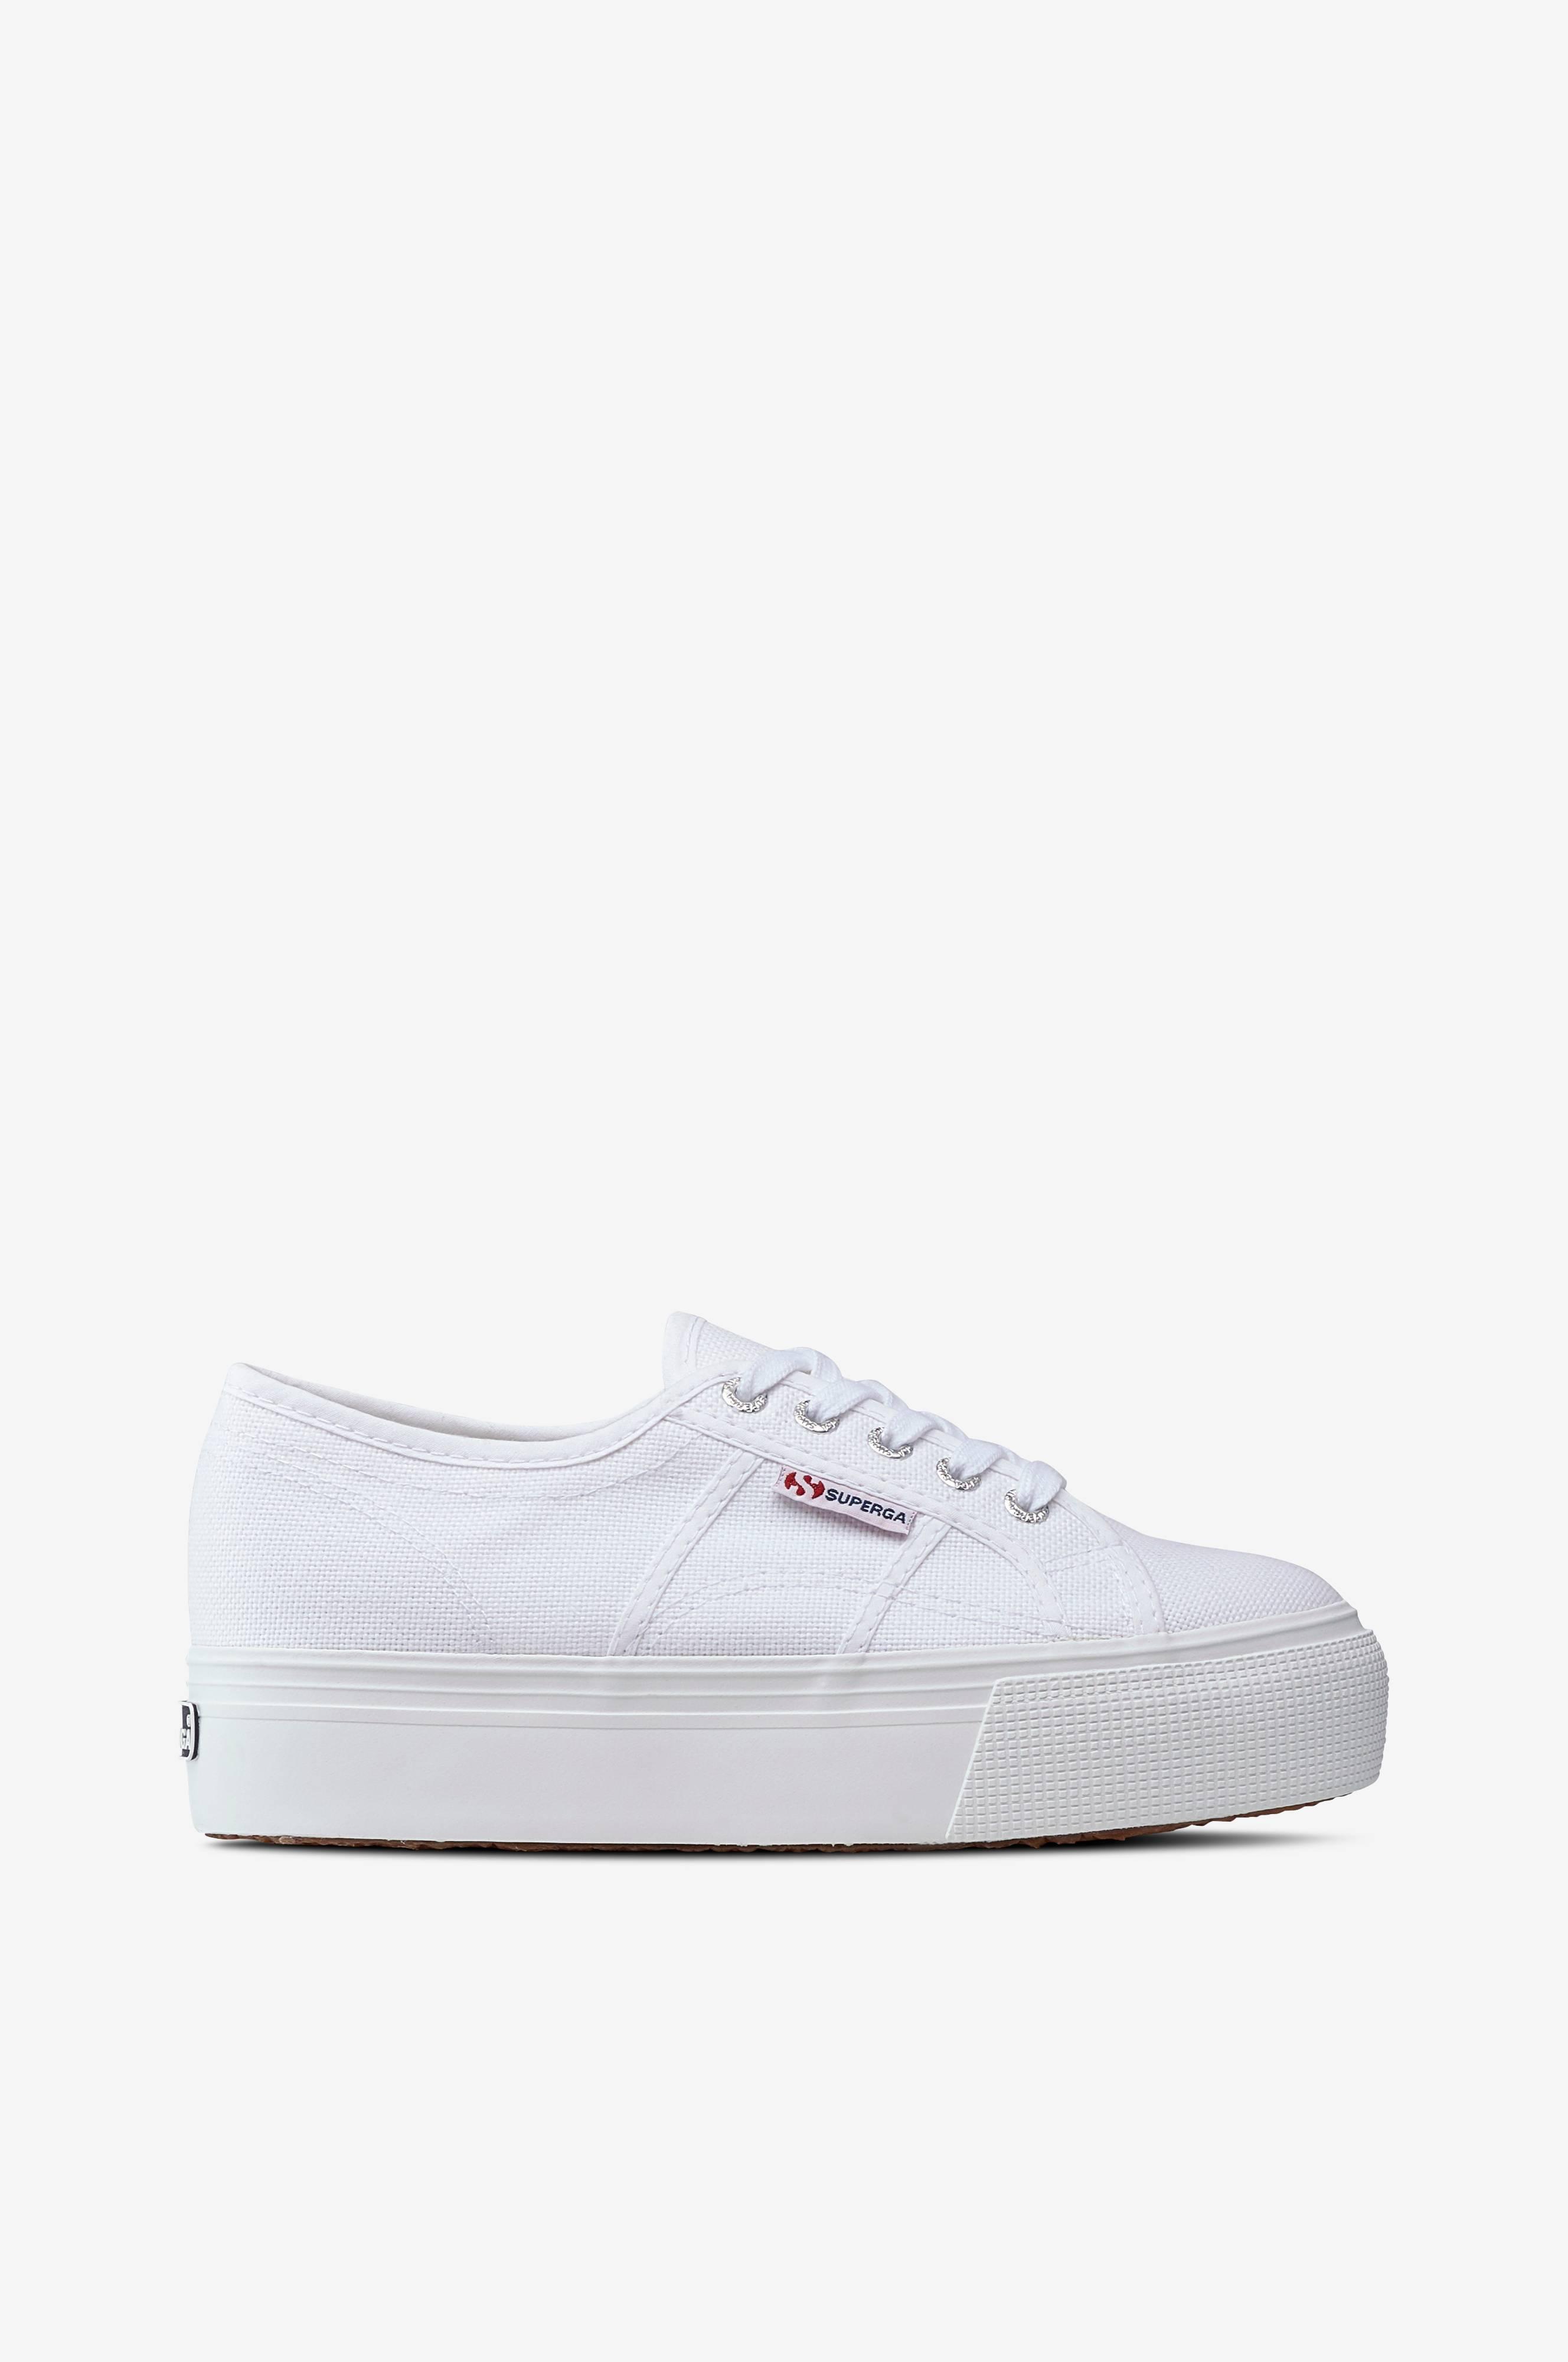 2ca91913 Superga Sneakers 2790 Acotw Linea - Hvit - Dame - Ellos.no